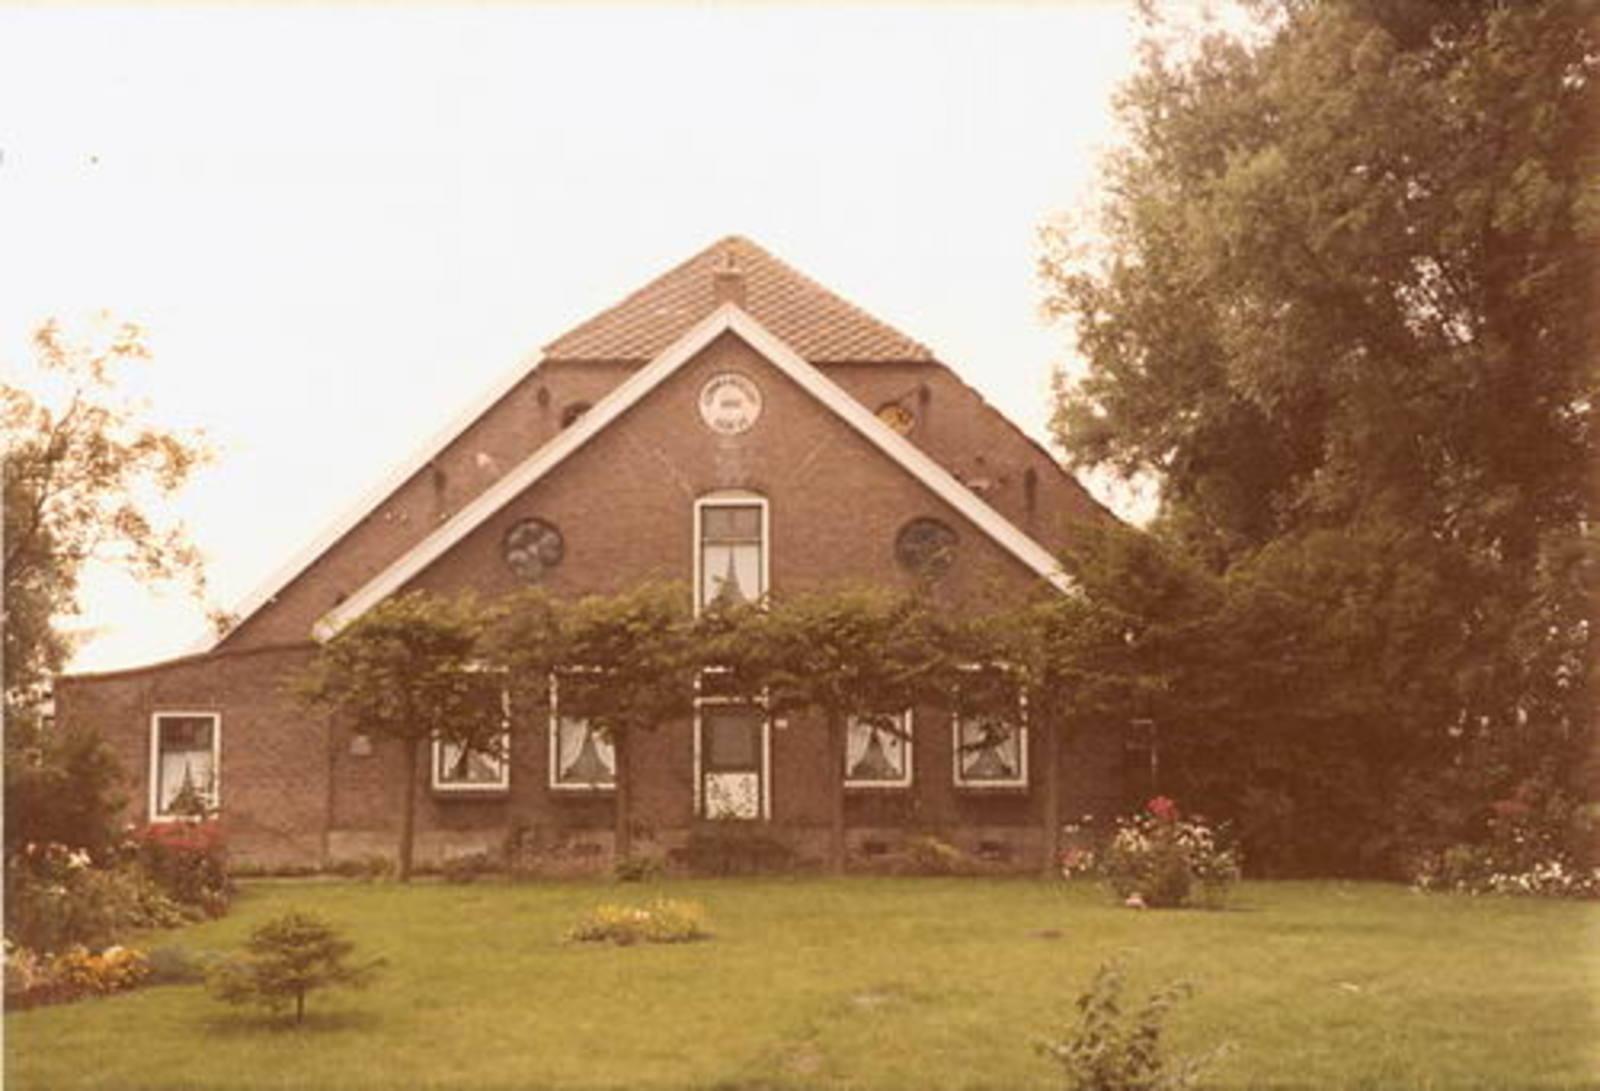 IJweg W 0921 1977 Commandeurs hoeve fam Koeckhoven